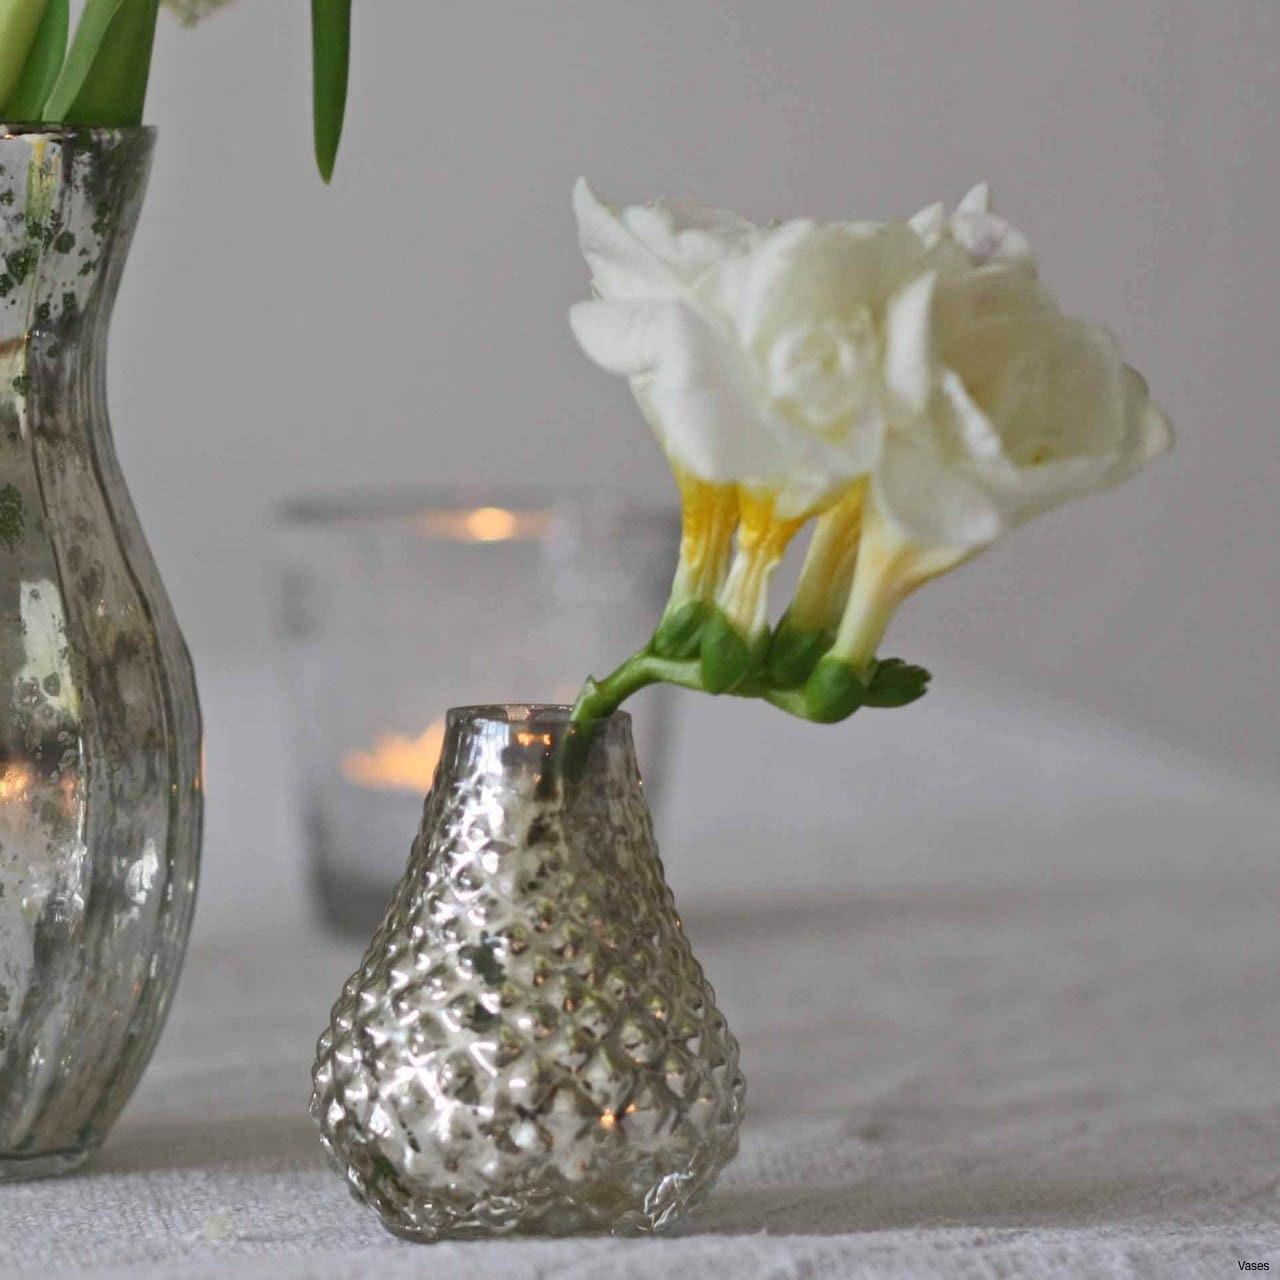 tiny glass bud vases of diy yard decor best of jar flower 1h vases bud wedding vase with diy yard decor best of jar flower 1h vases bud wedding vase centerpiece idea i 0d